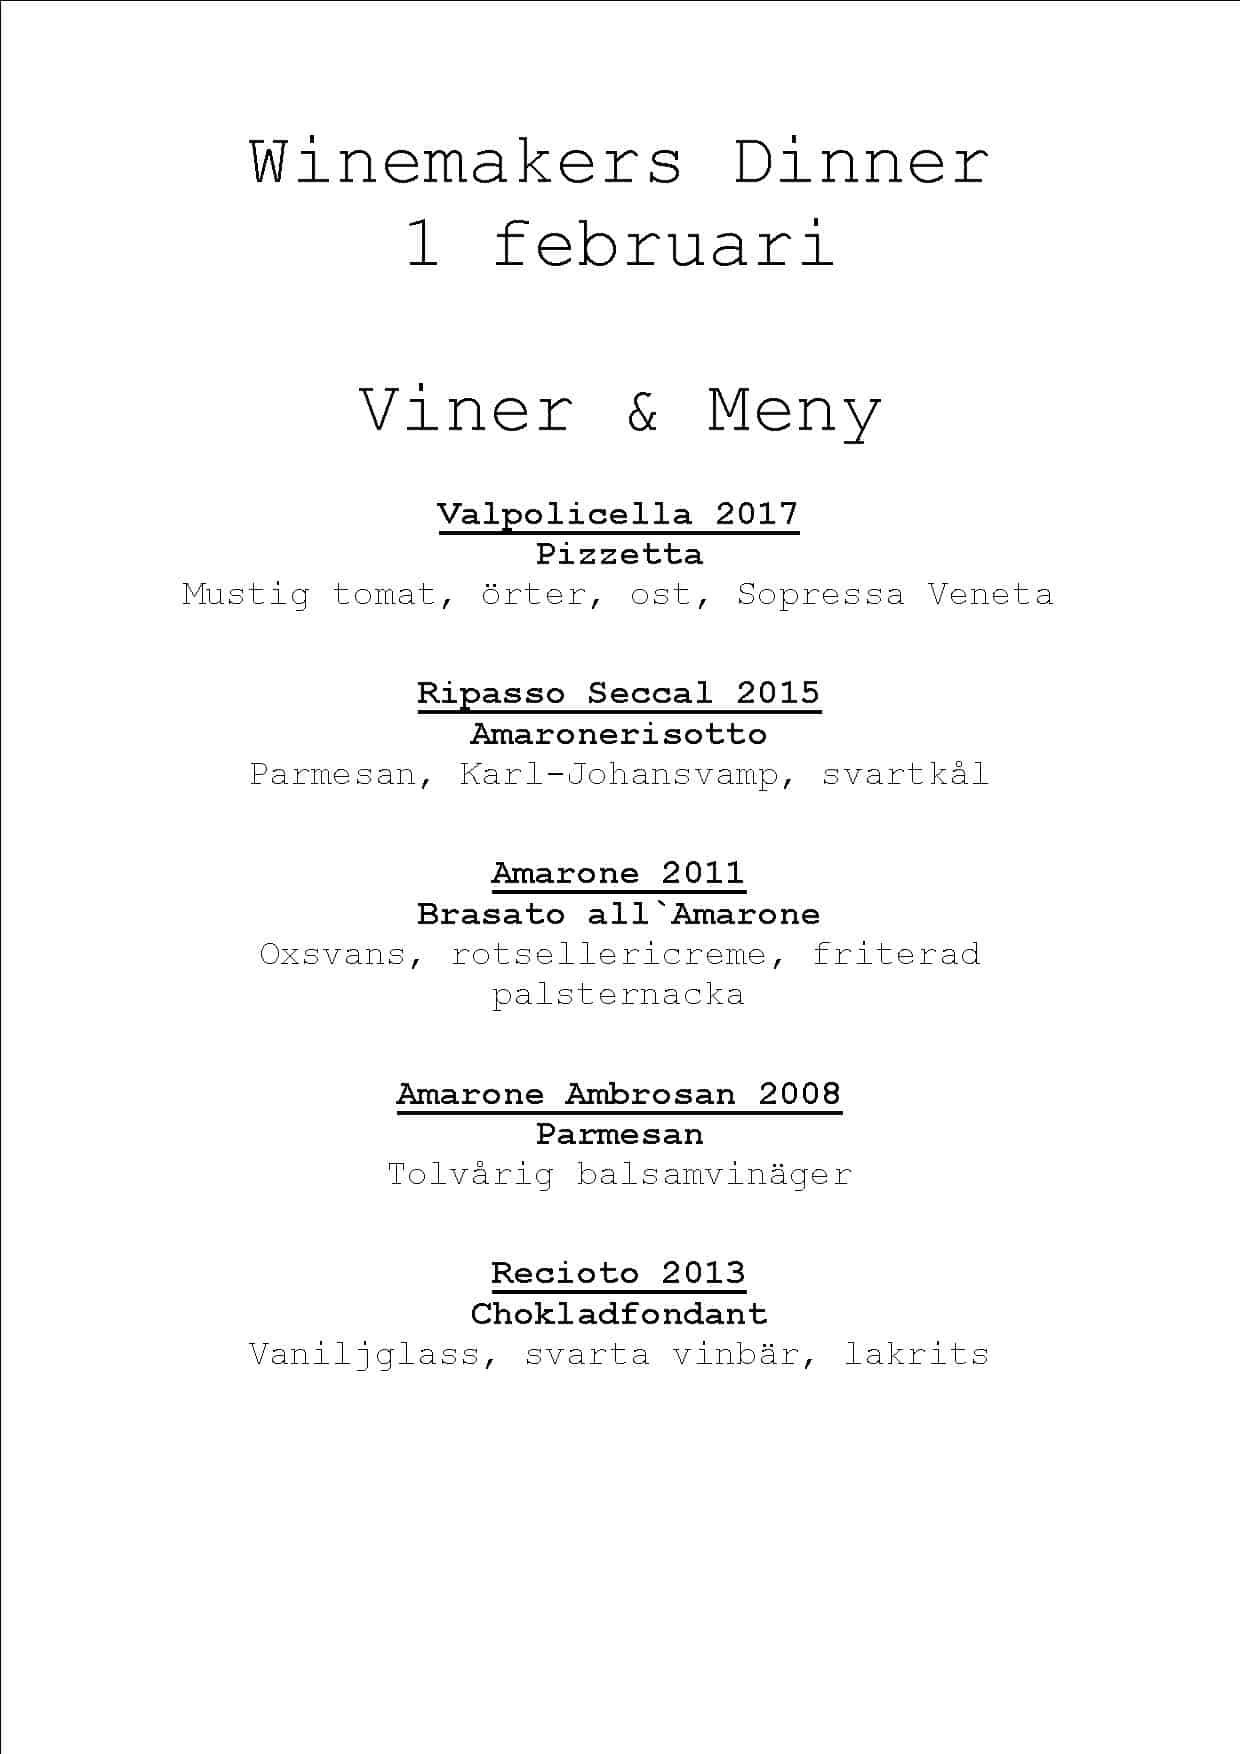 winemakers dinner meny